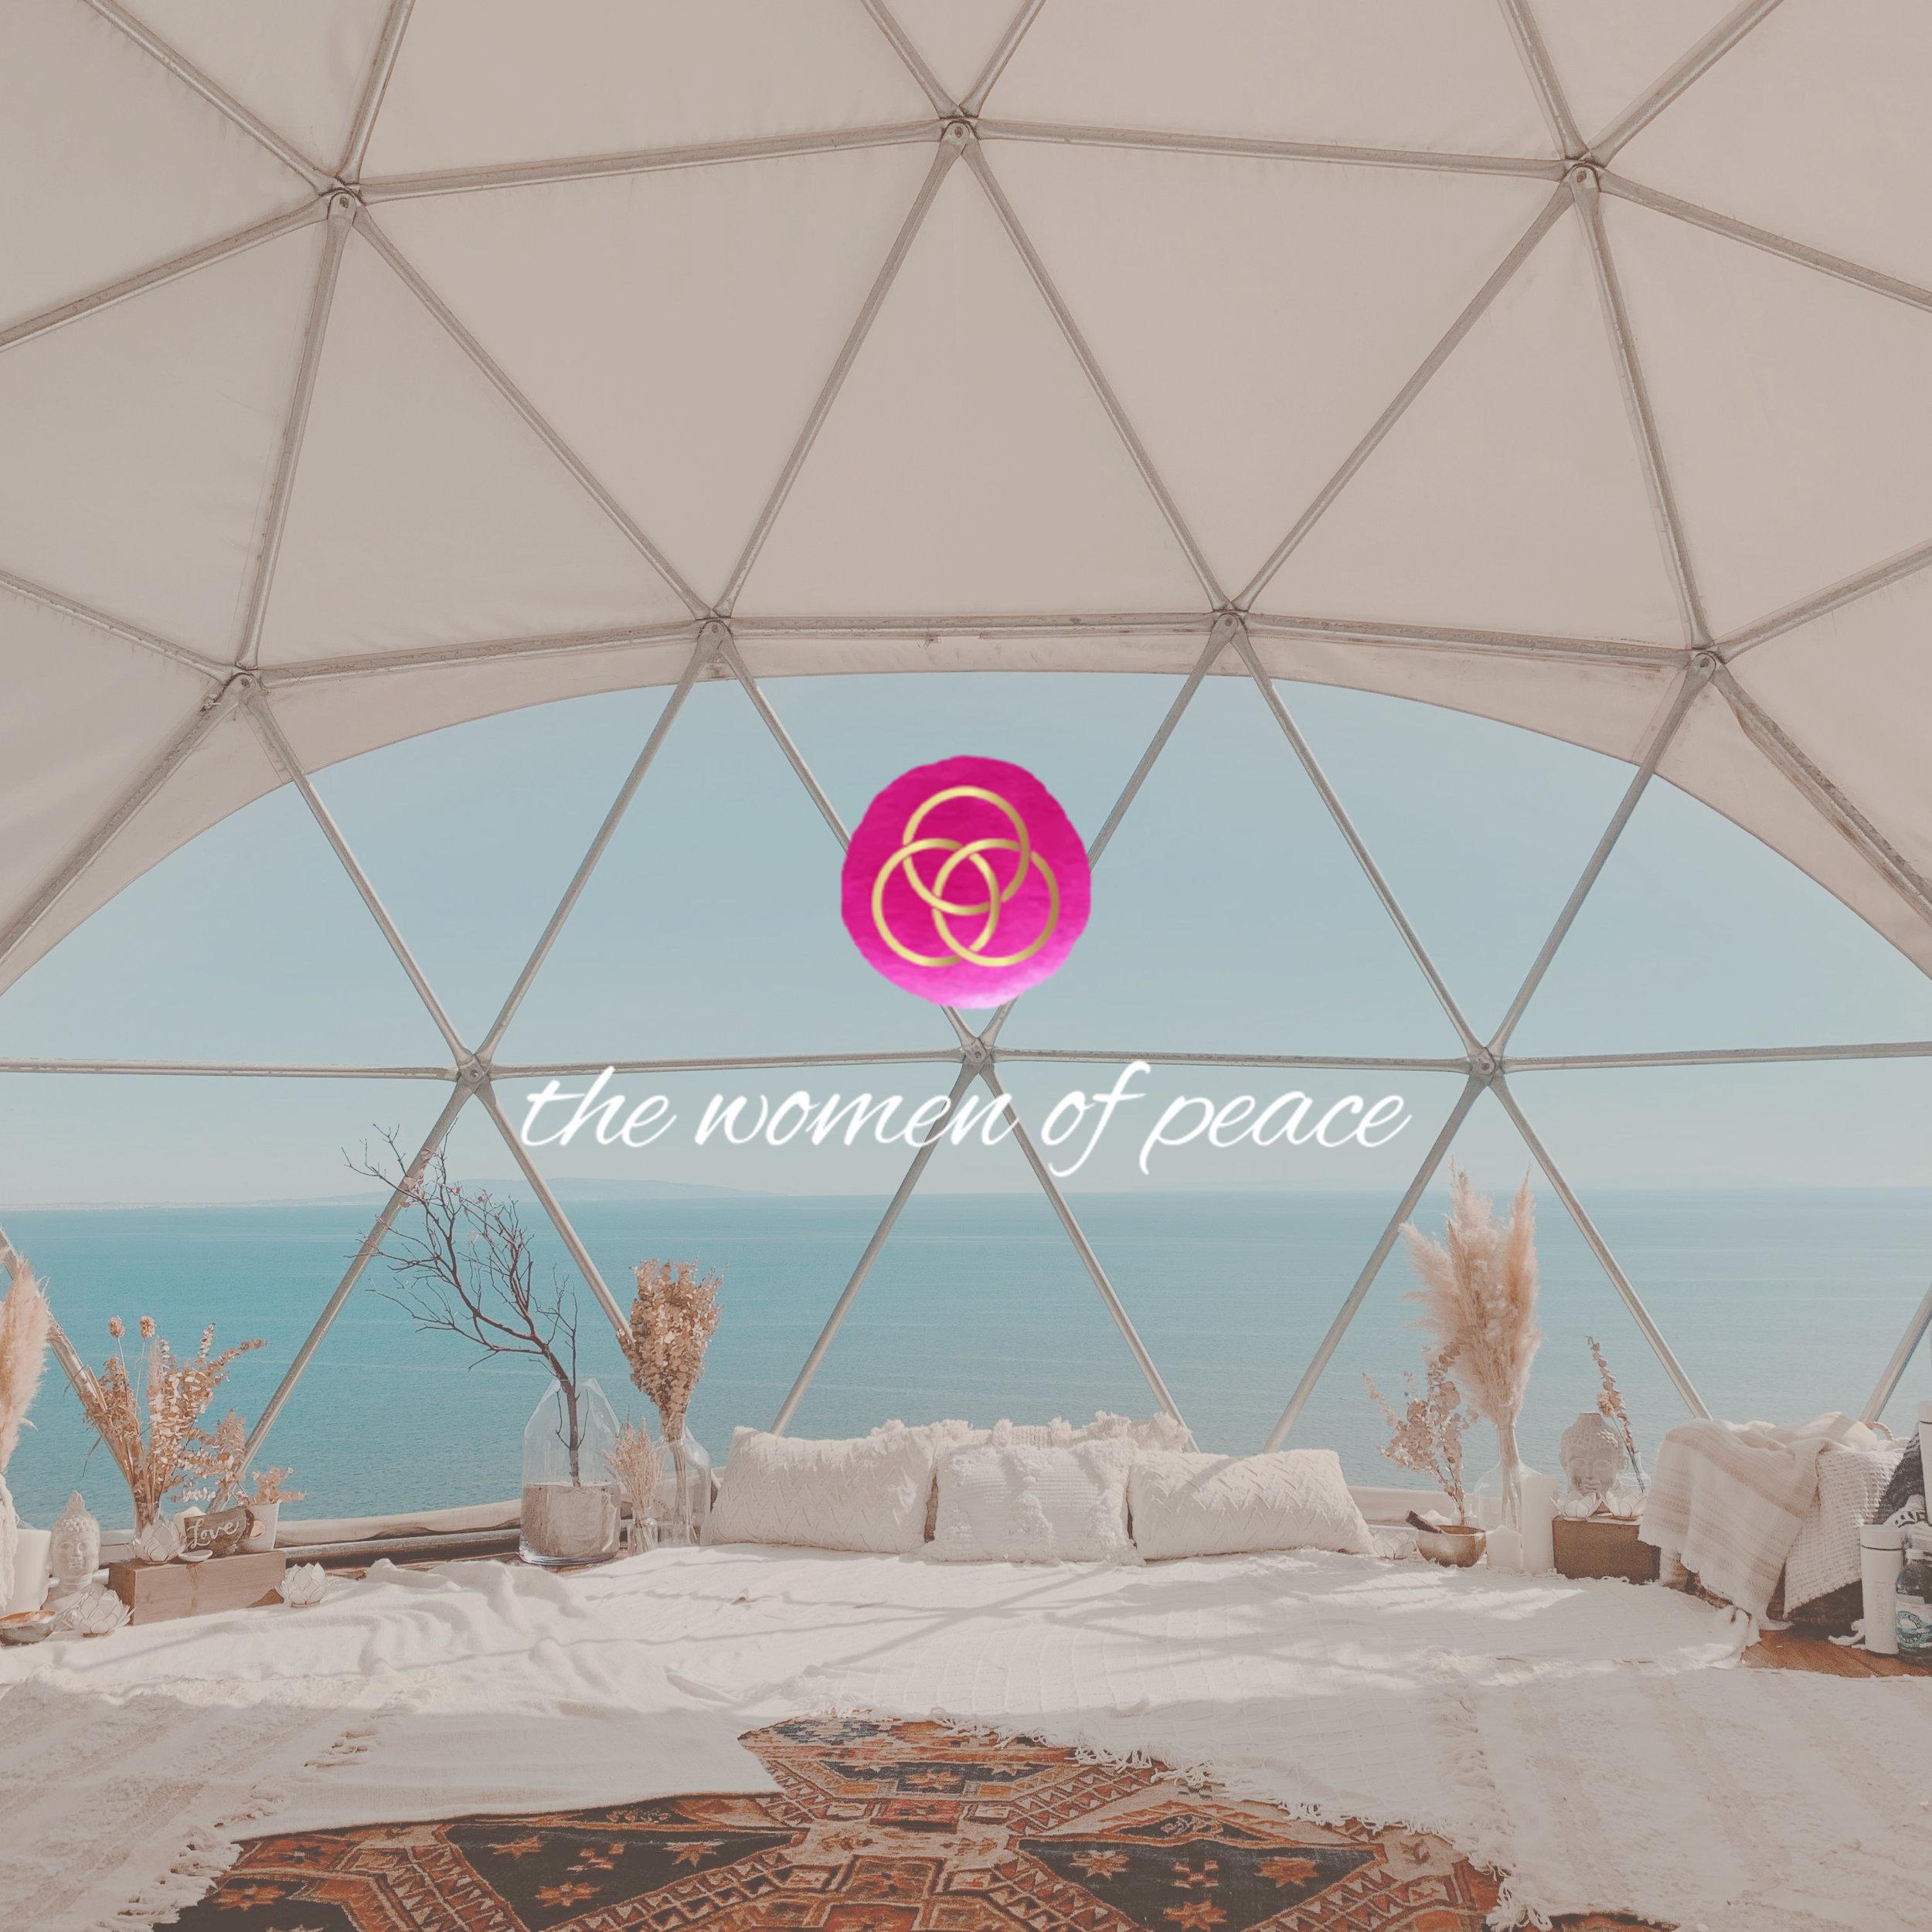 malibu+healing+haven+five+sense+collective+women+of+peace+sound+bath+meditation+1111+web.jpg